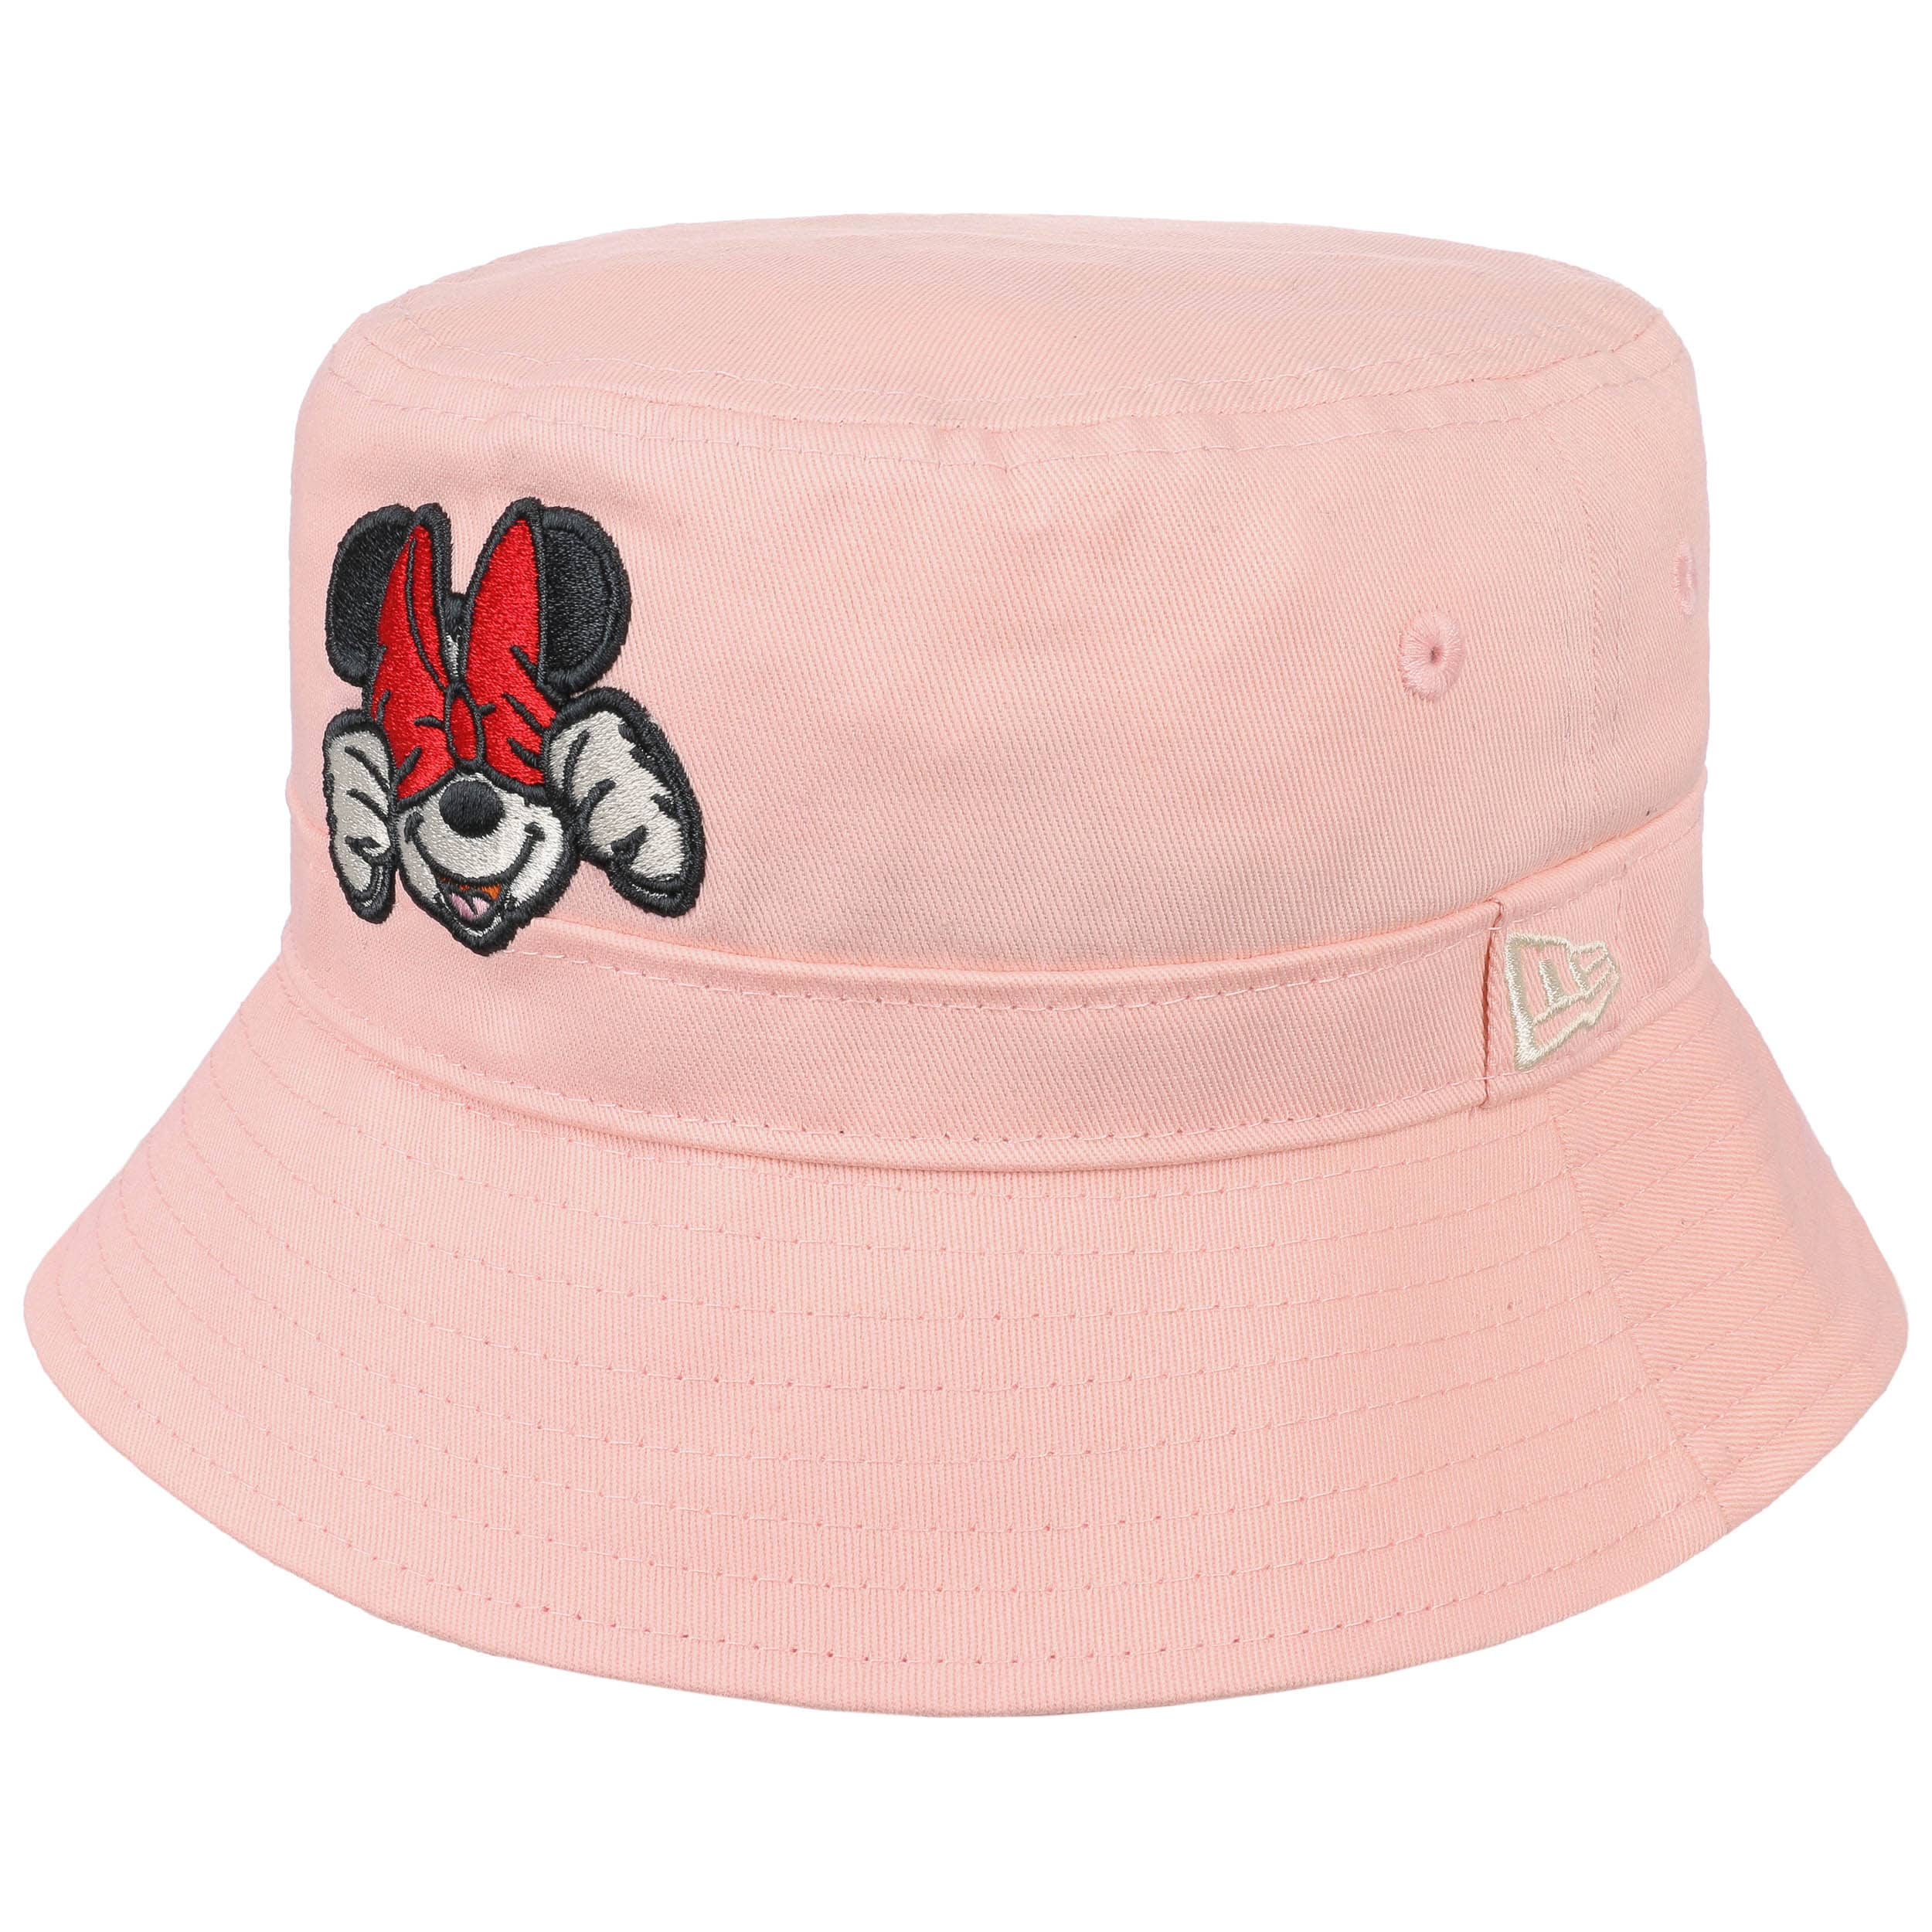 157f3416147 Minnie Mouse Kids Bucket Hat by New Era